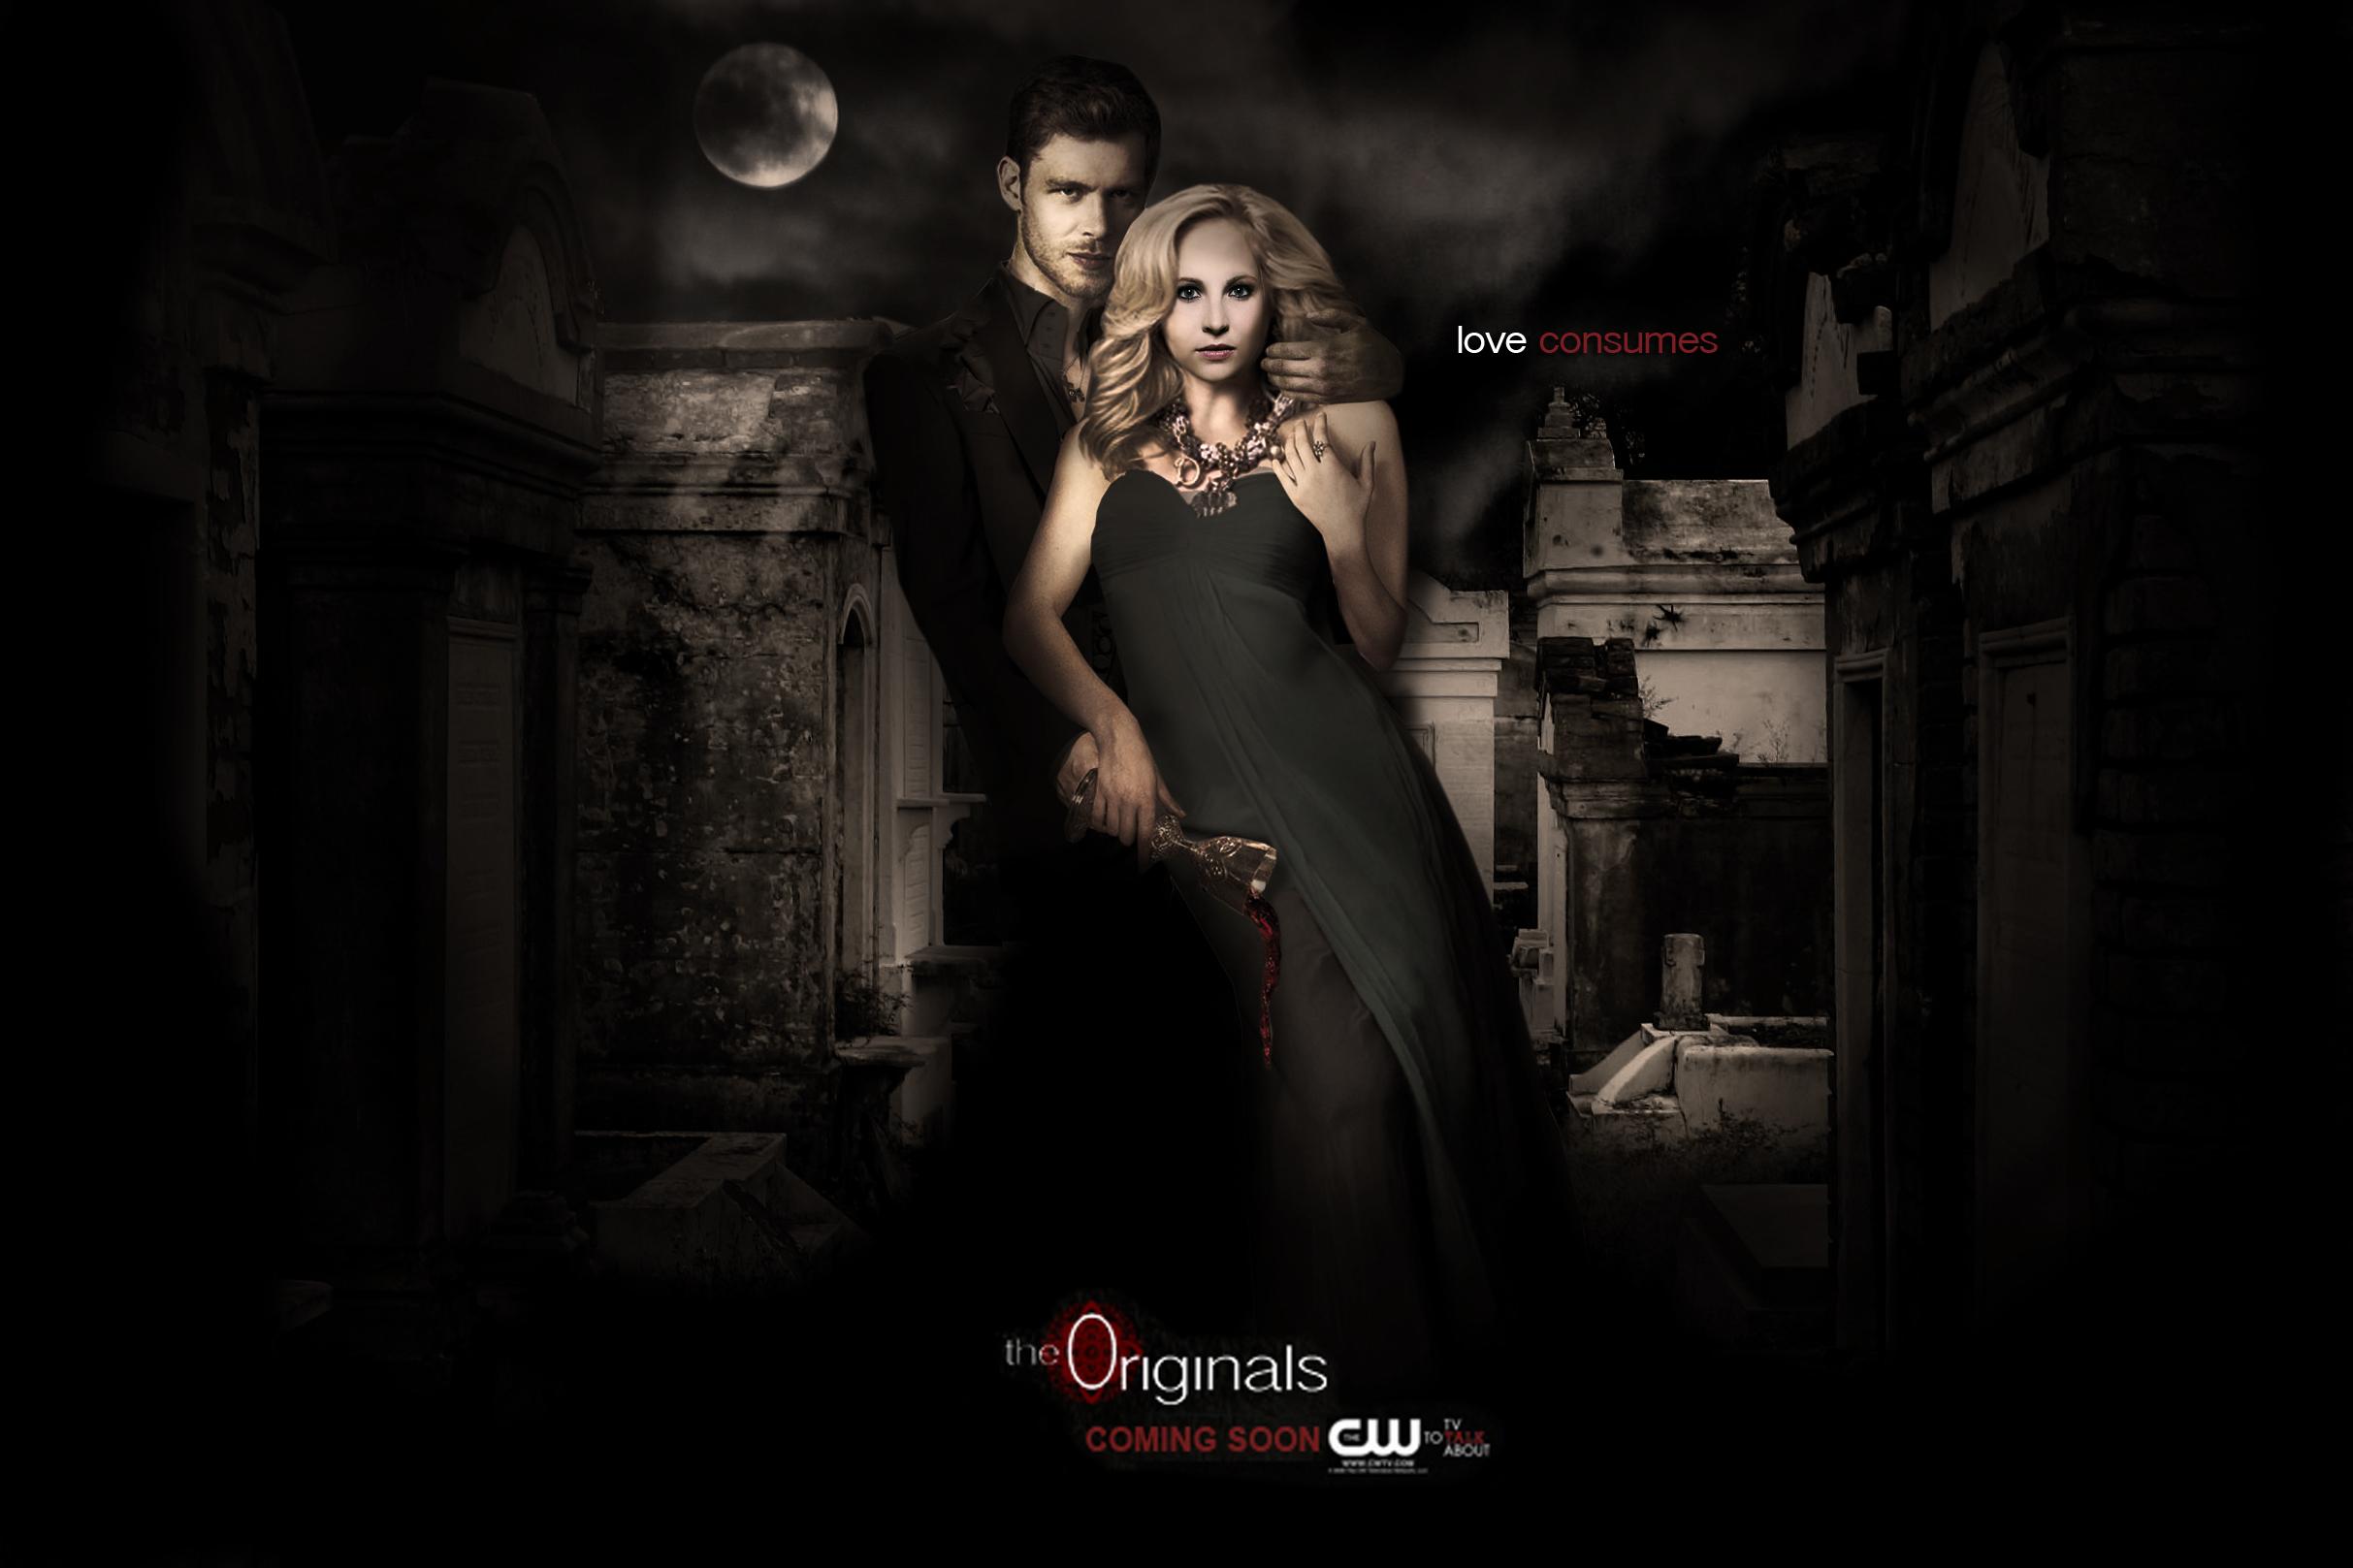 The Originals Hd Background Klaus Y Caroline The Originals 1429782 Hd Wallpaper Backgrounds Download